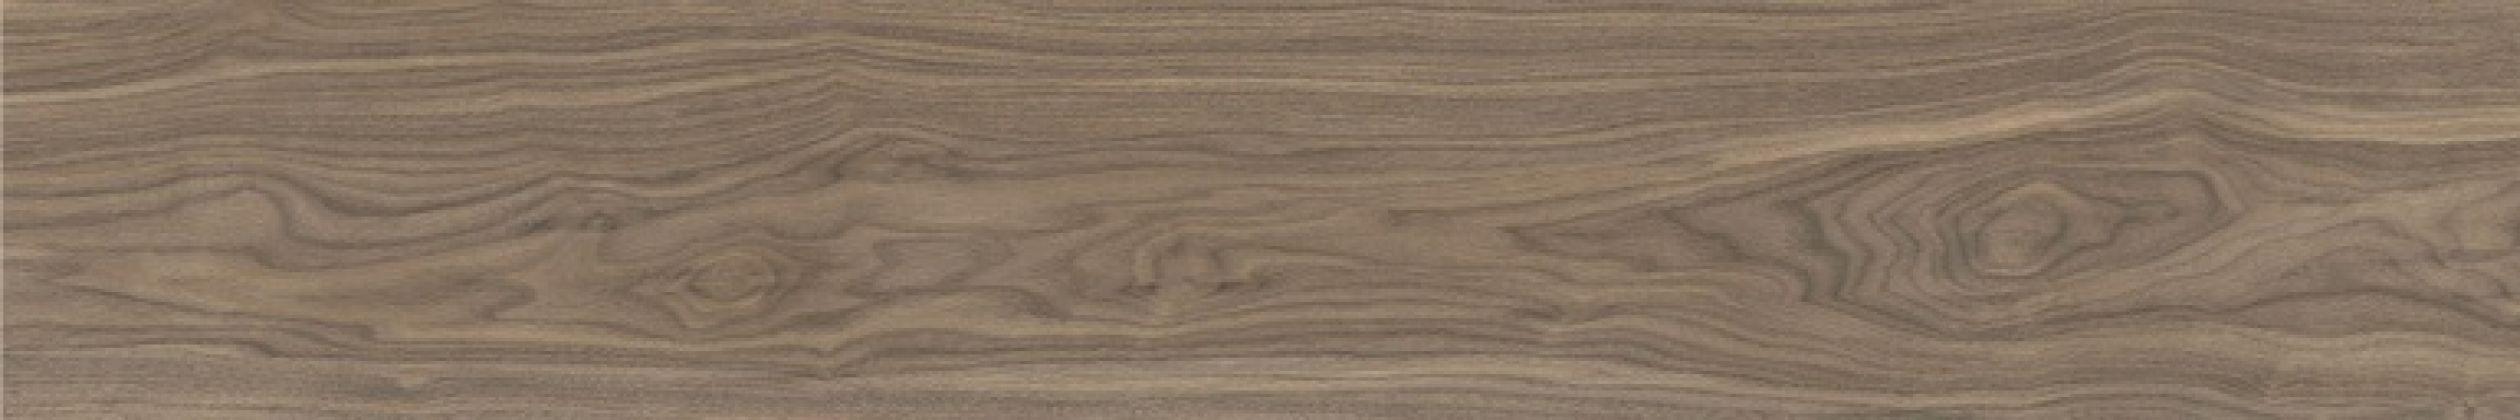 Wood-X Орех Тауп Матовый R10A 7Рек 20x120